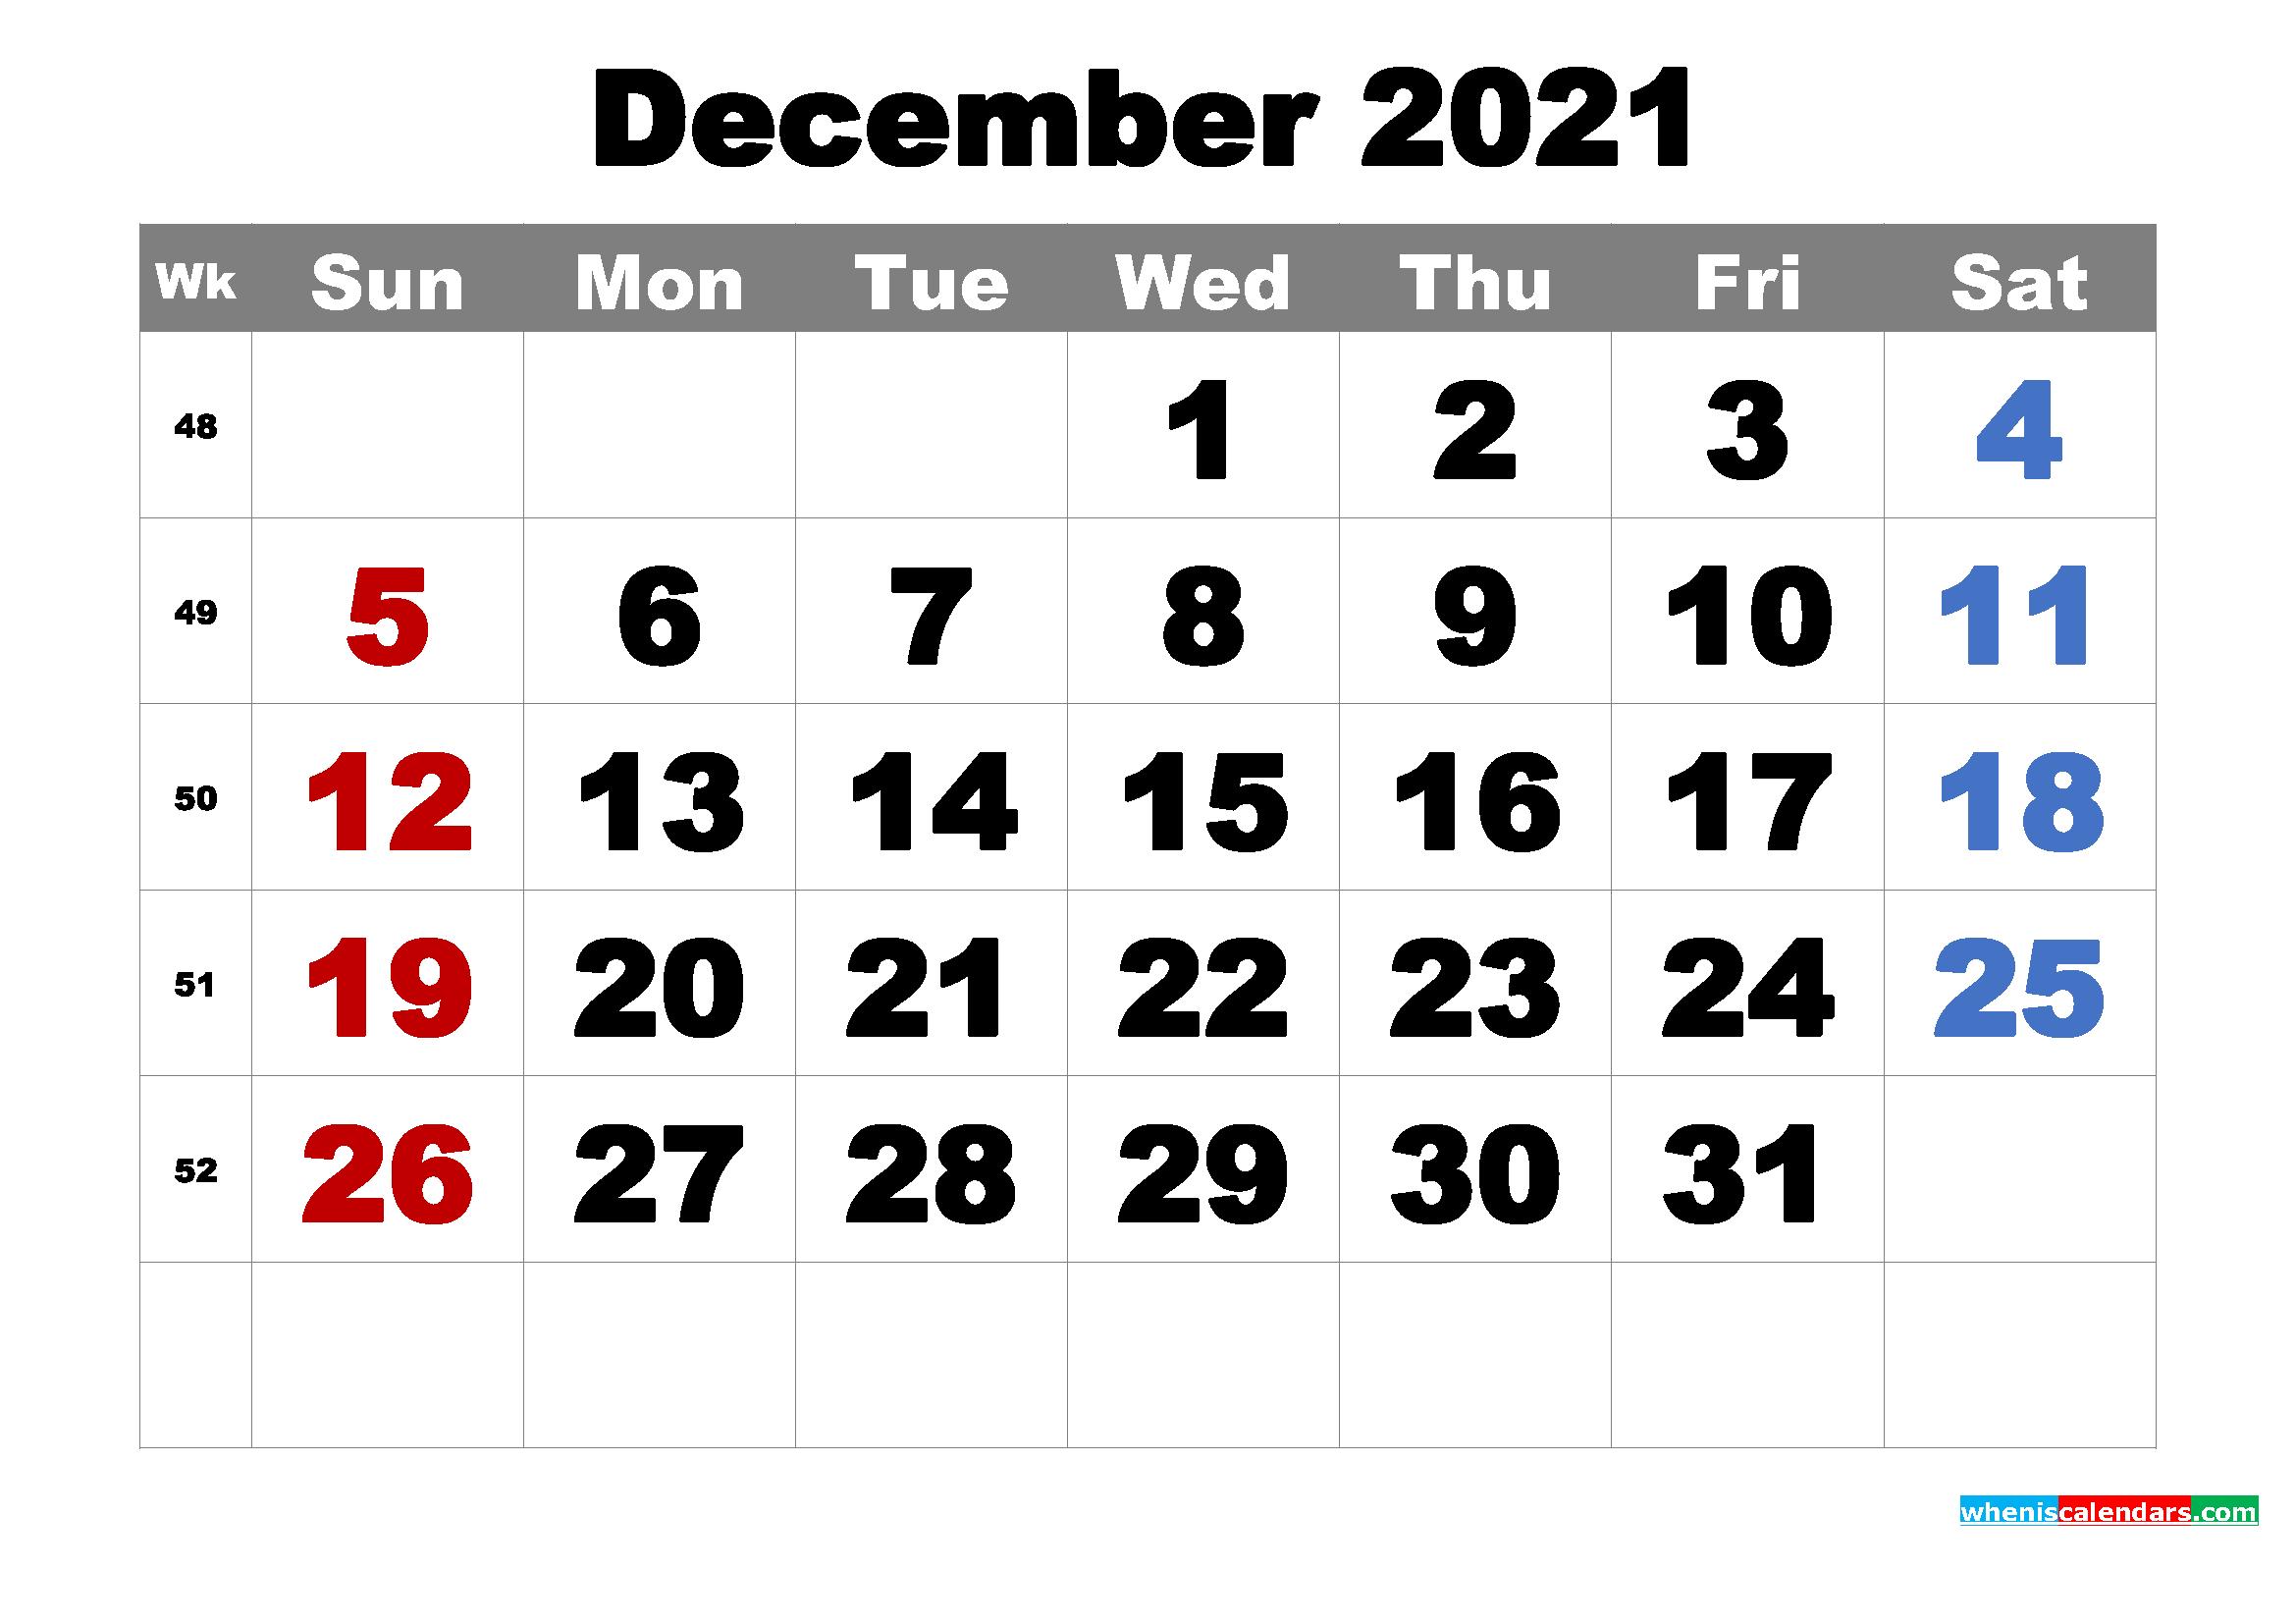 Free Printable December 2021 Calendar Word, PDF, Image ...